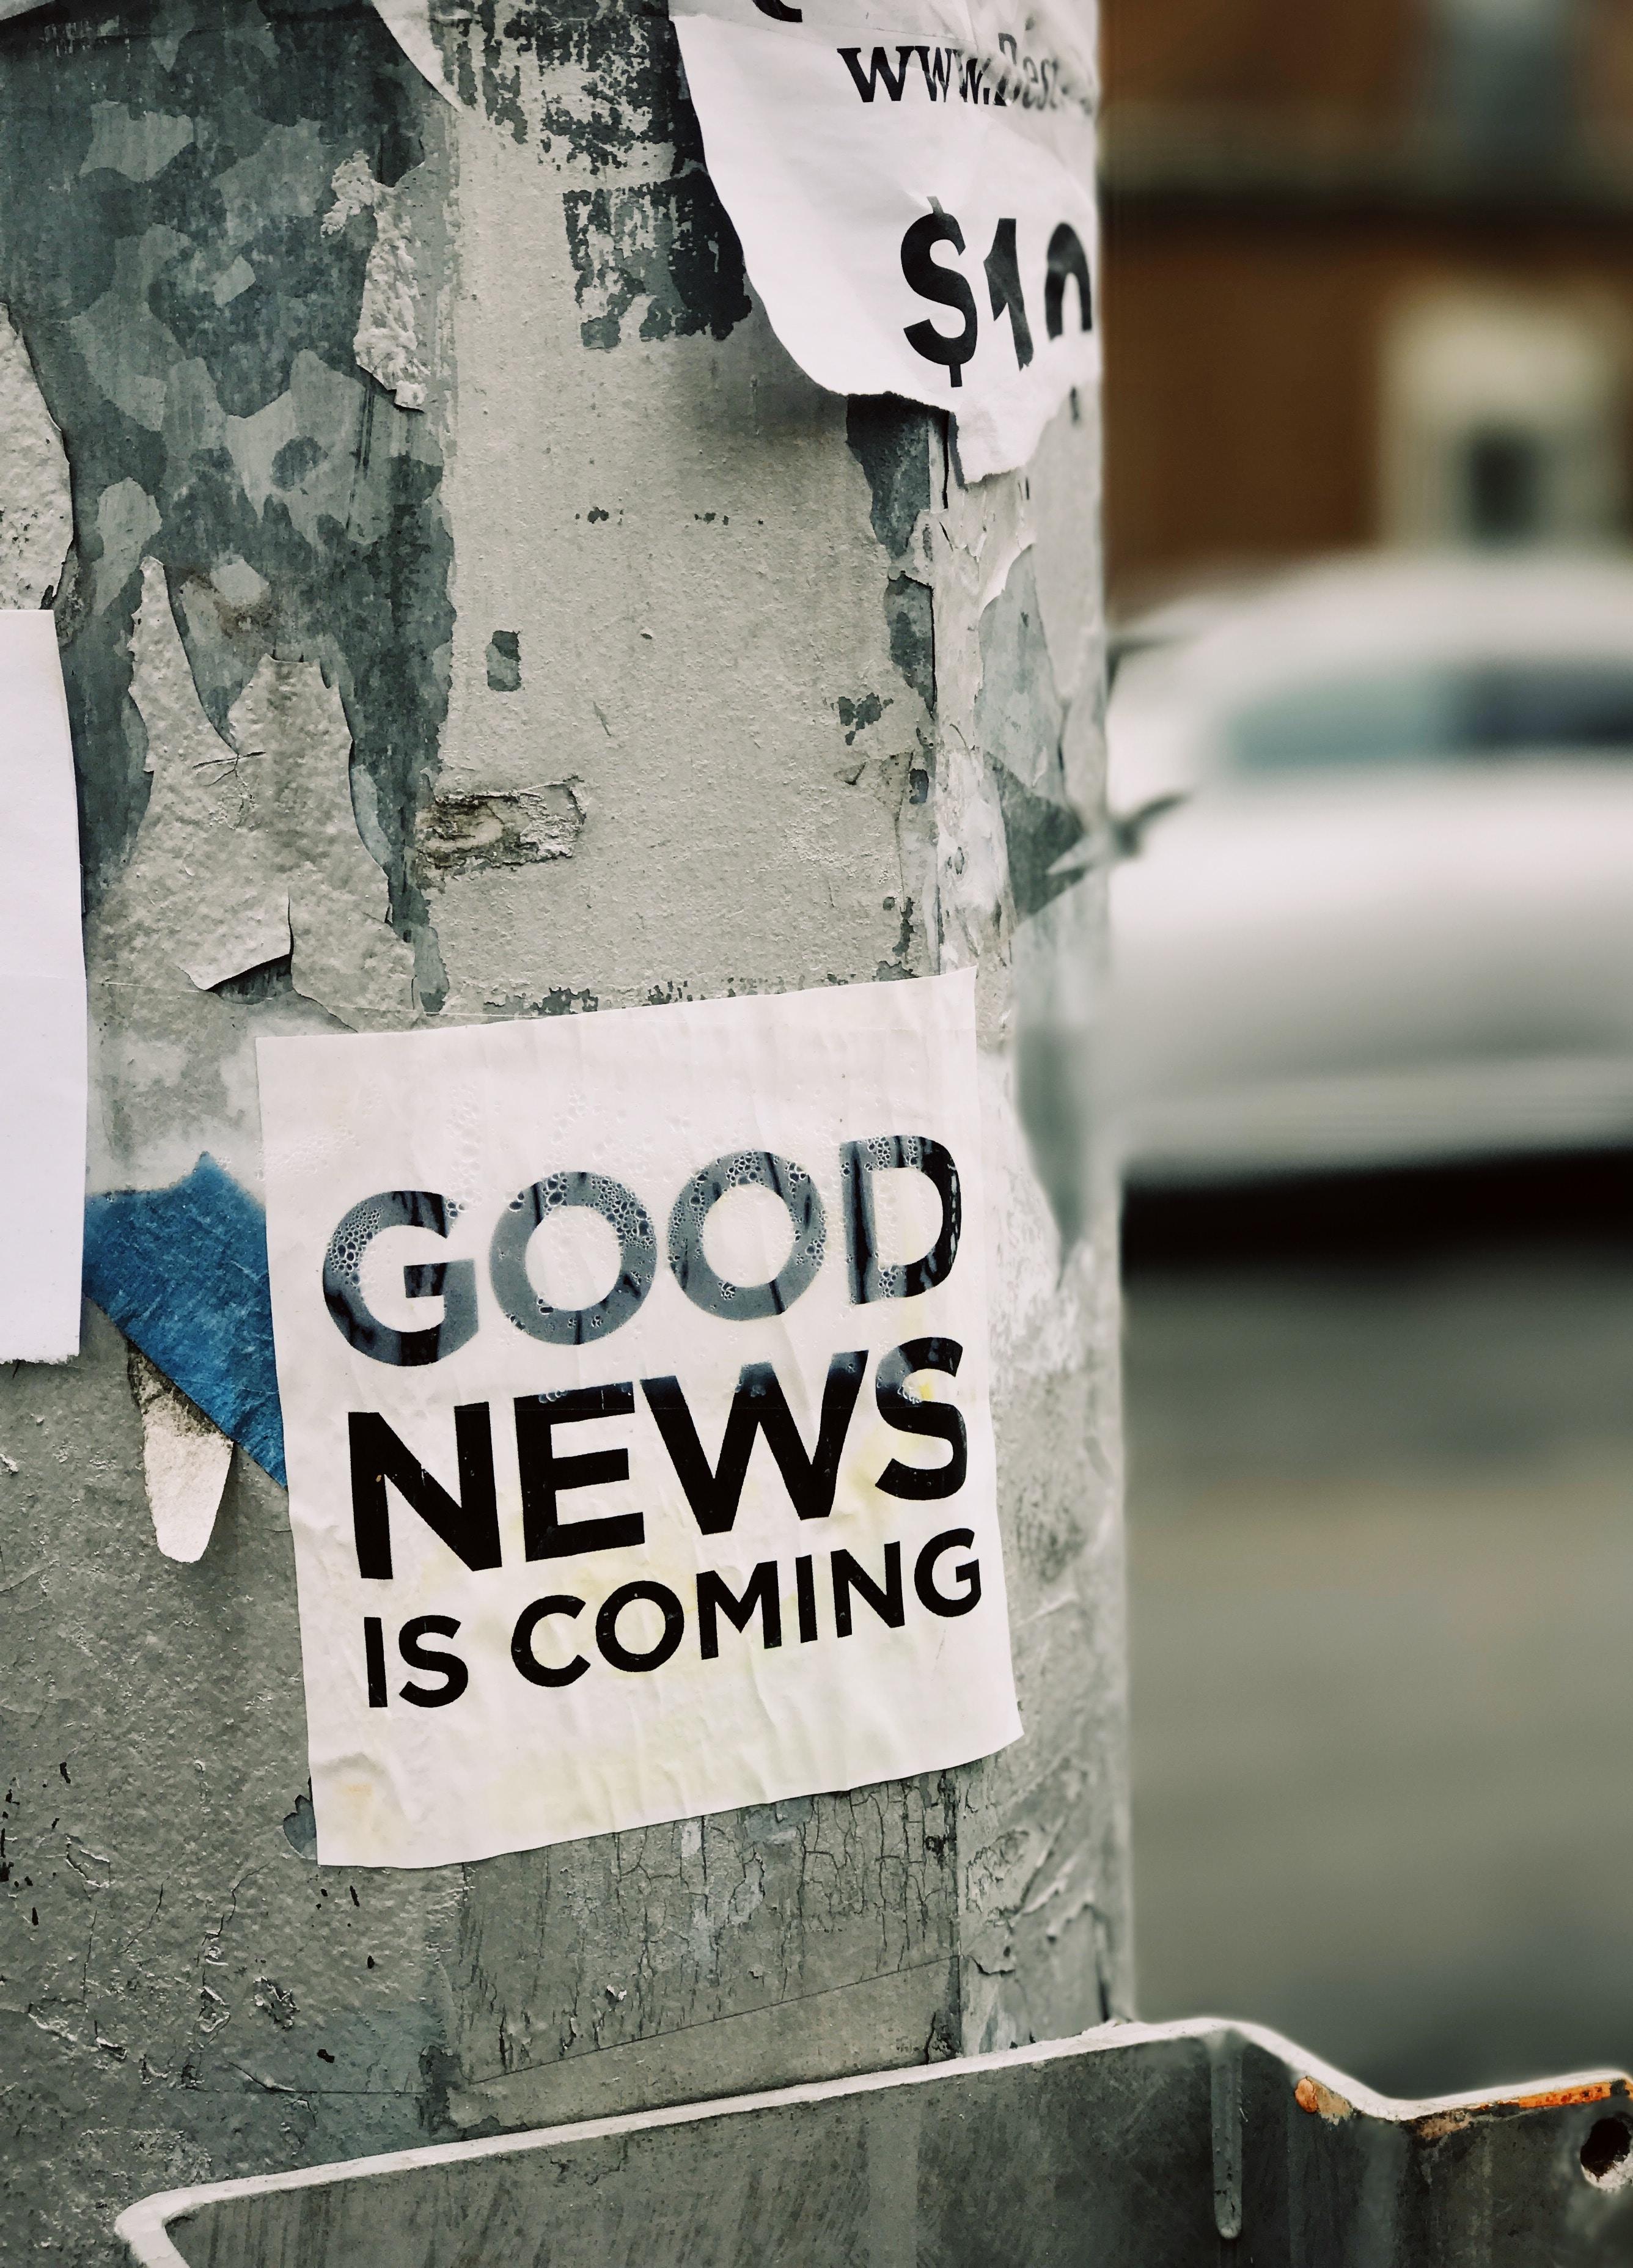 Bring the Good News